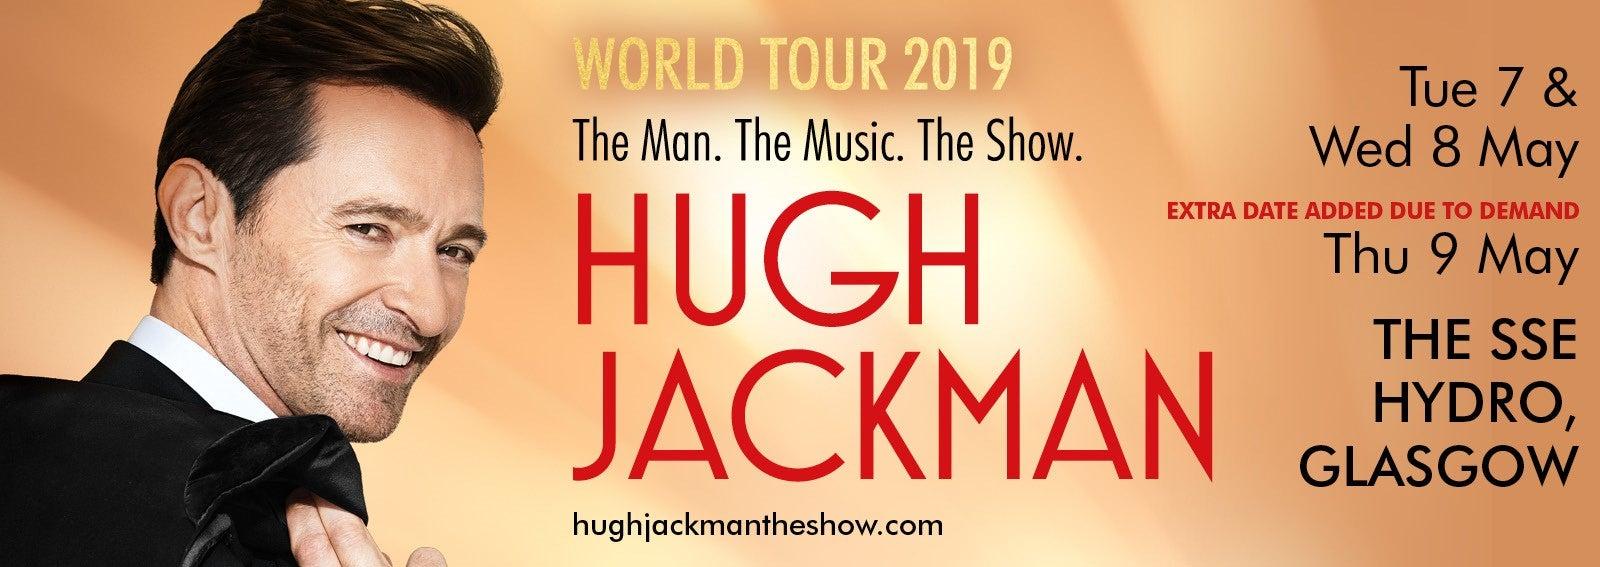 Hugh_Jackman_extra_dates_1600x567.jpg